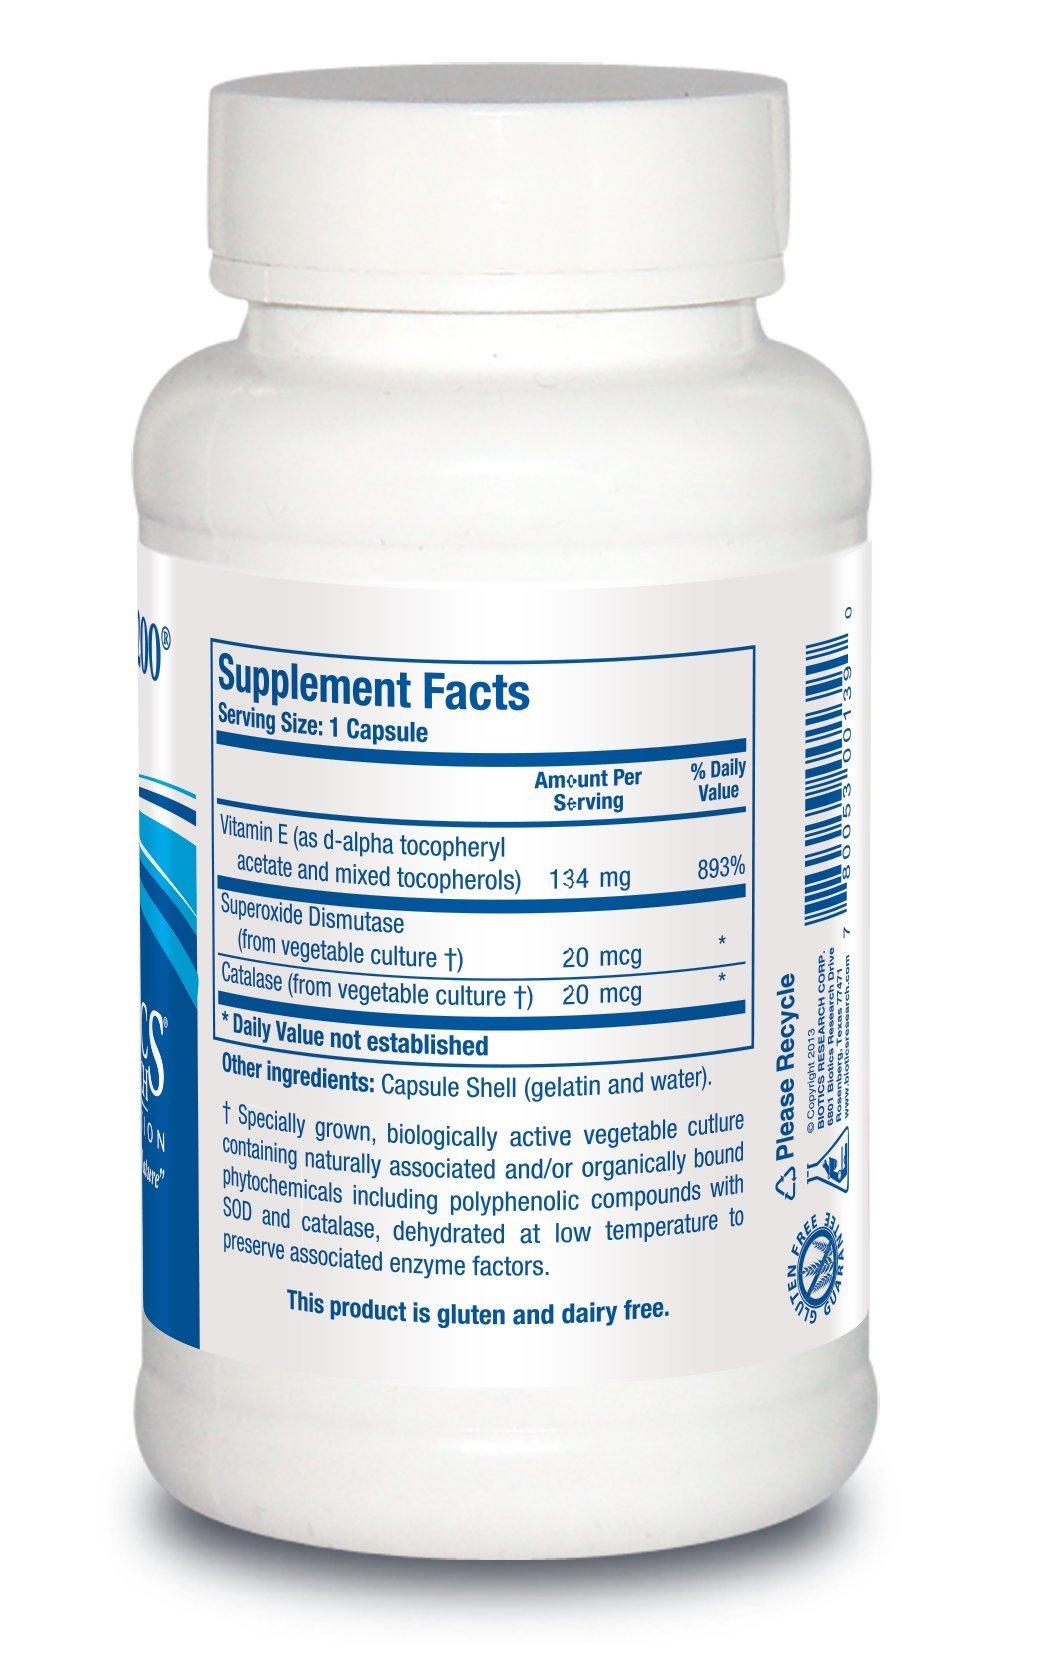 Biotics Research E-Mulsion 200- Emulsified, Enhanced Absorption, Vitamin E, Mixed Tocopherols, Antioxidant, Cardiovascular Health, Immune Support 90 caps